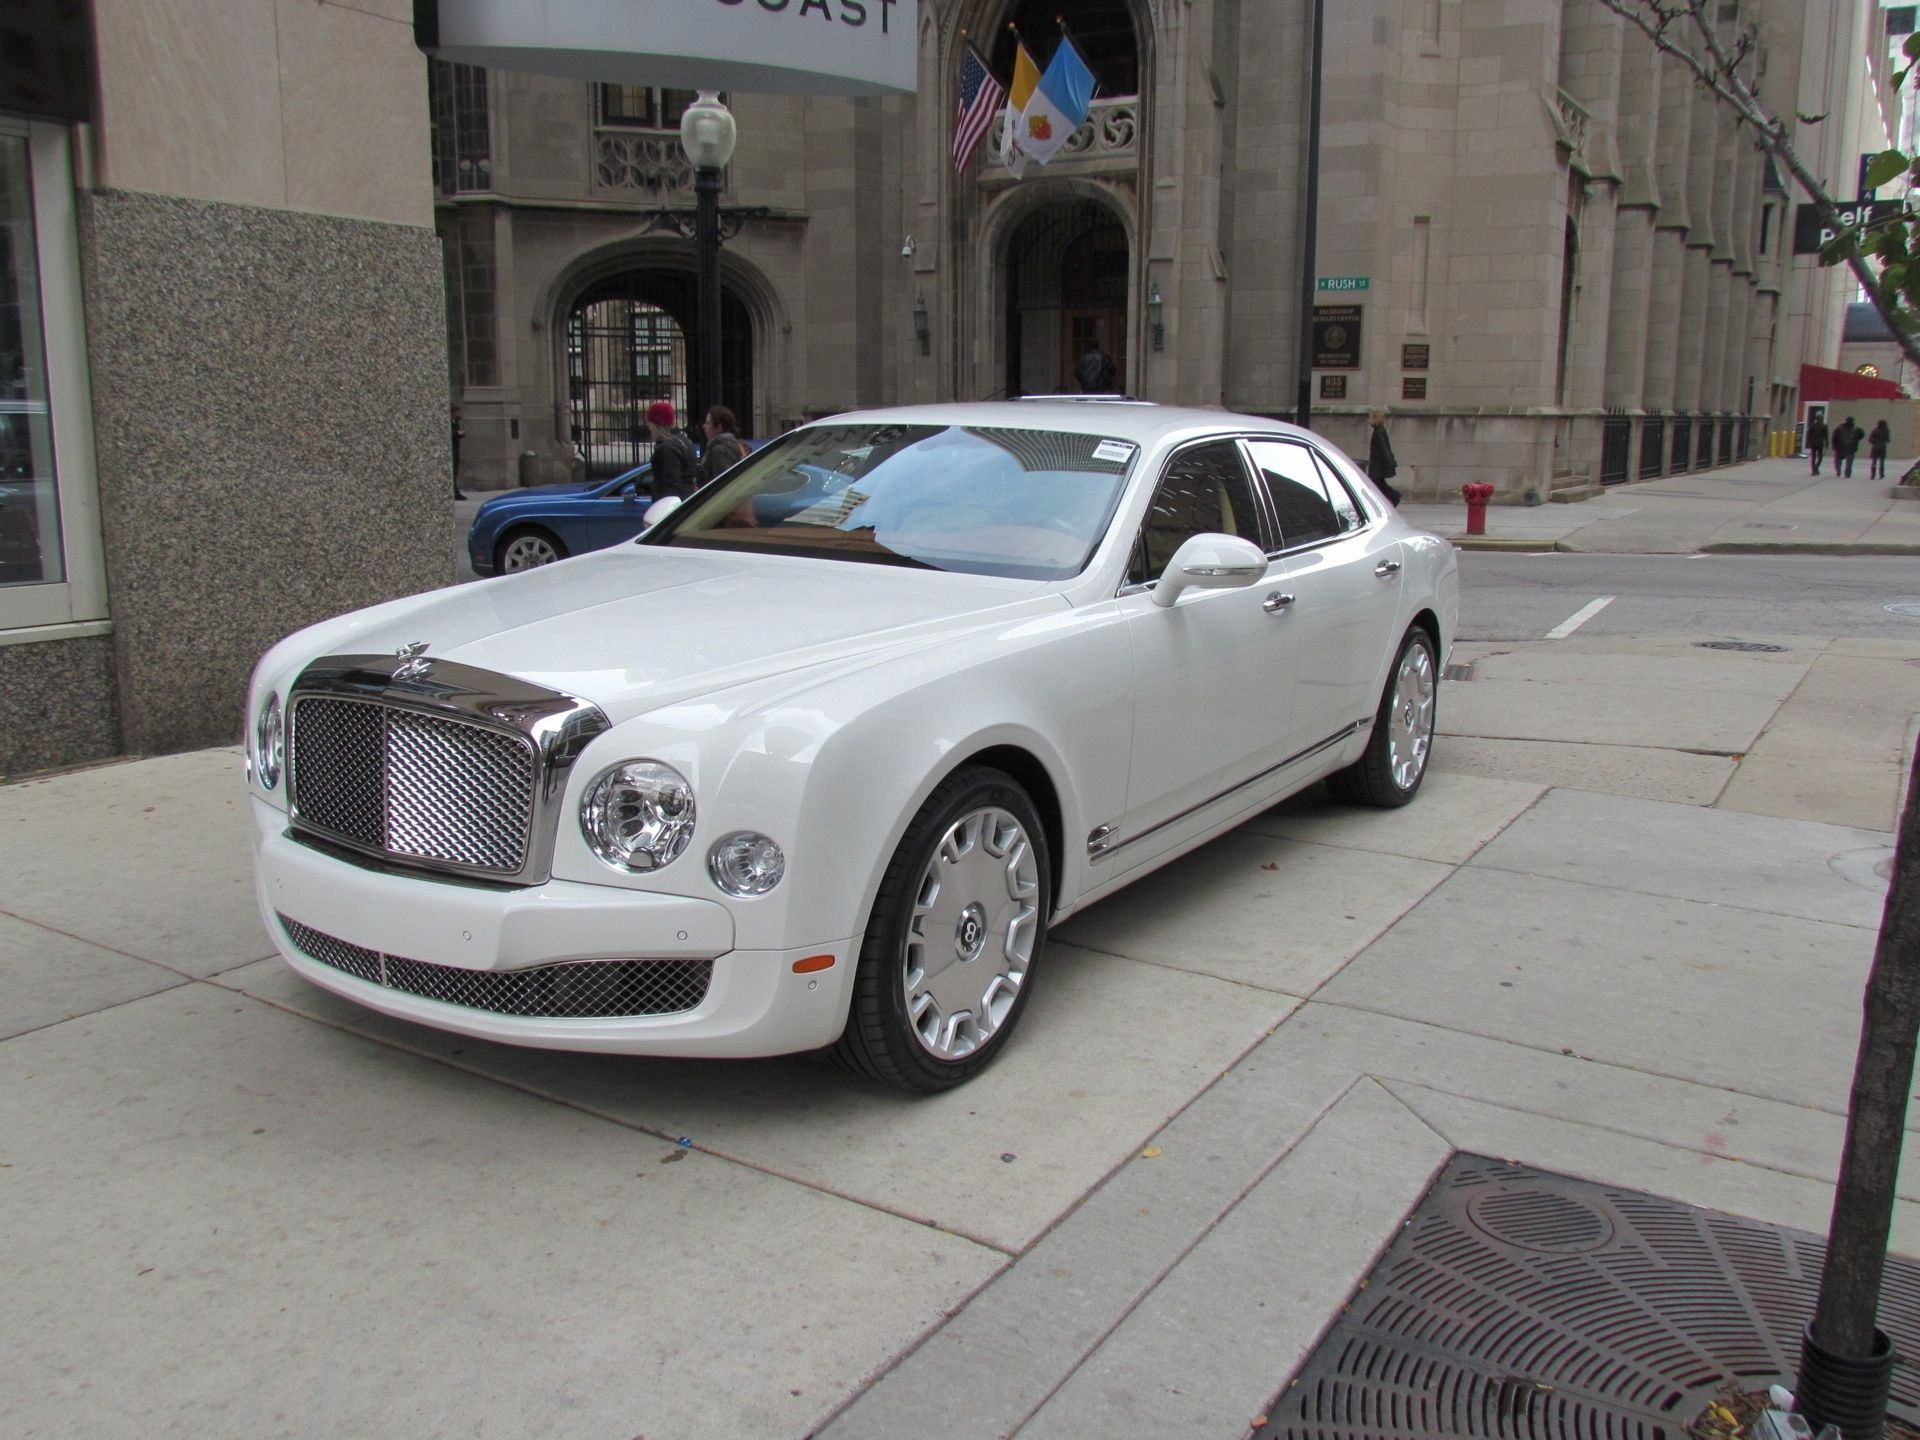 New 2018 Rolls Royce Phantom Chicago IL Rolls Royce